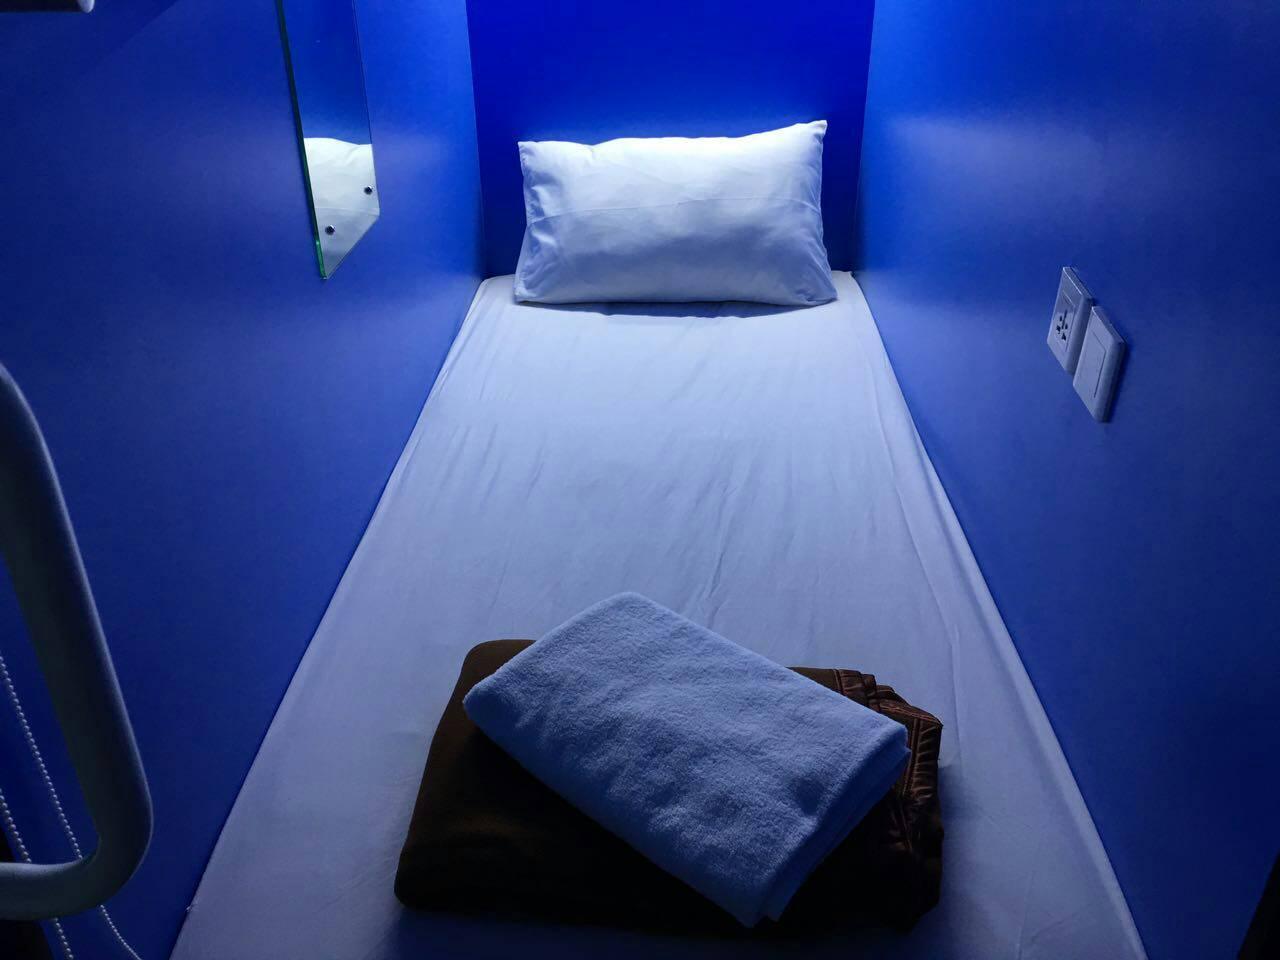 Hotel QB Sleep Capsule Hotel - Patih Jelantik Street Blok PM 1 No.10 - Central Park Kuta, Bali - Bali